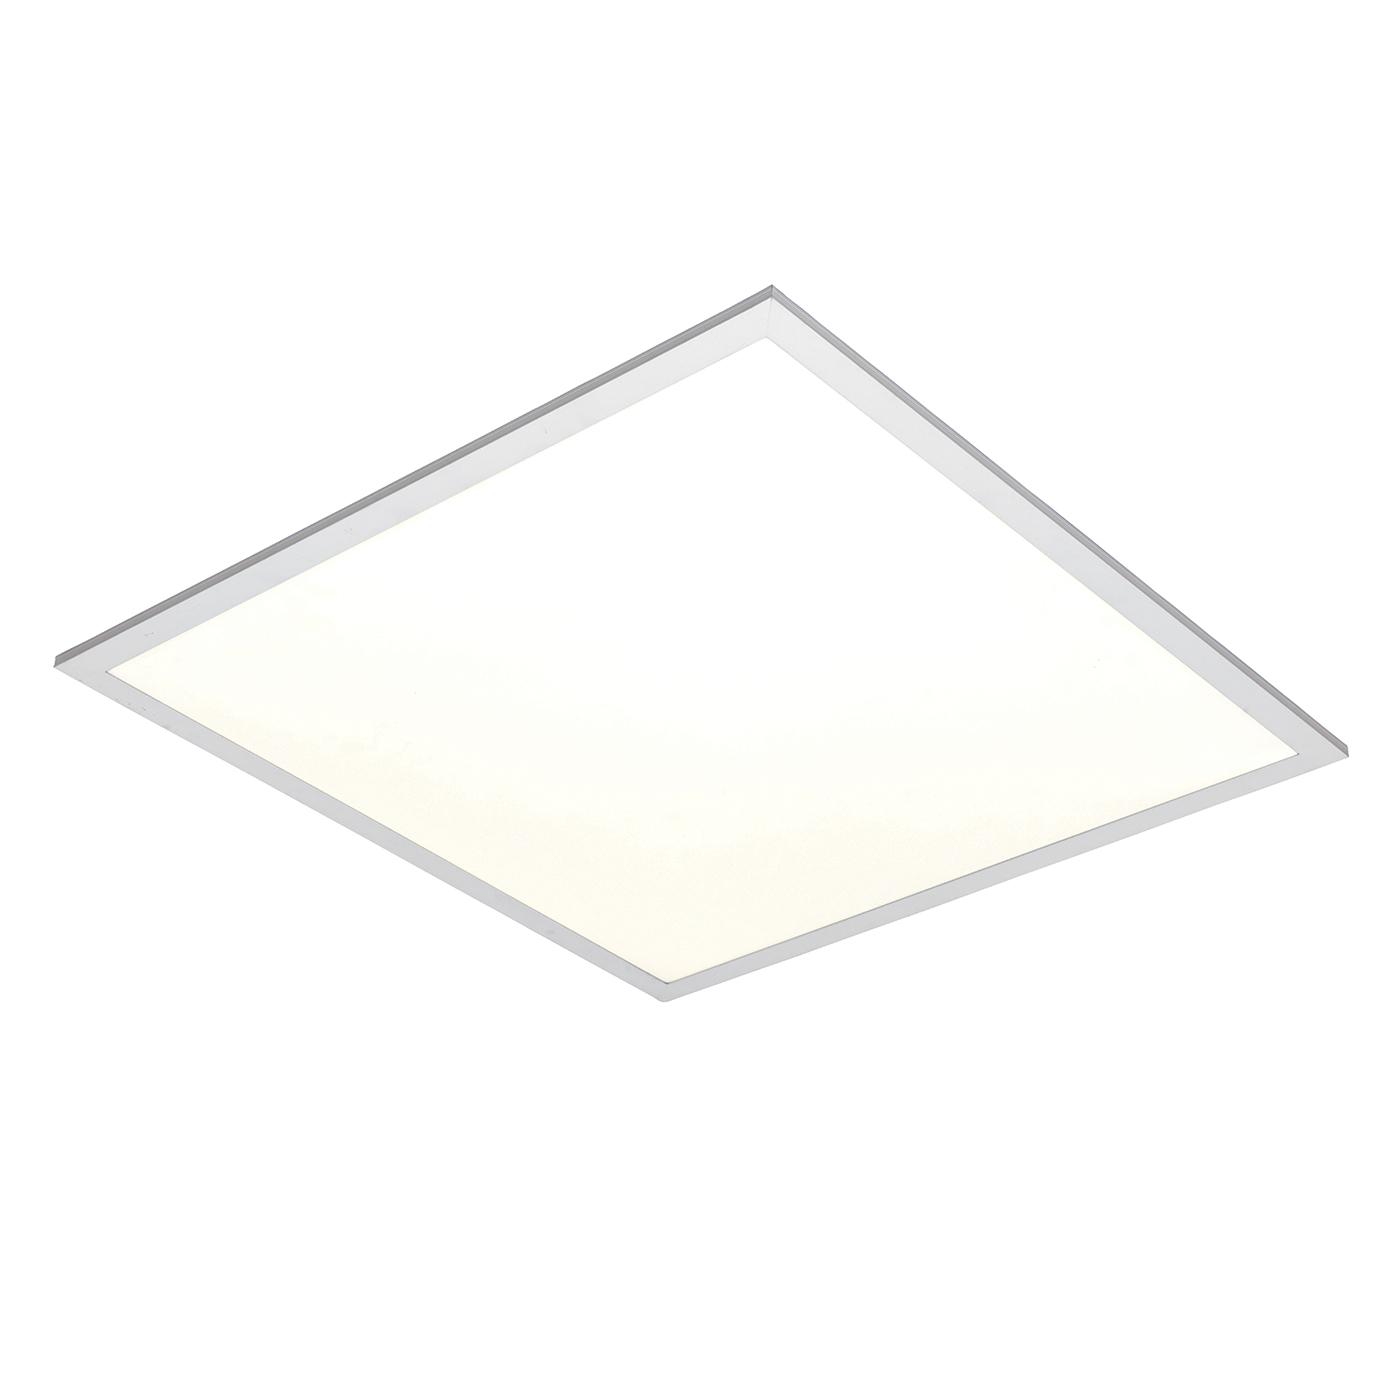 Saxby Avanti regolabile LED da incasso a soffitto ...